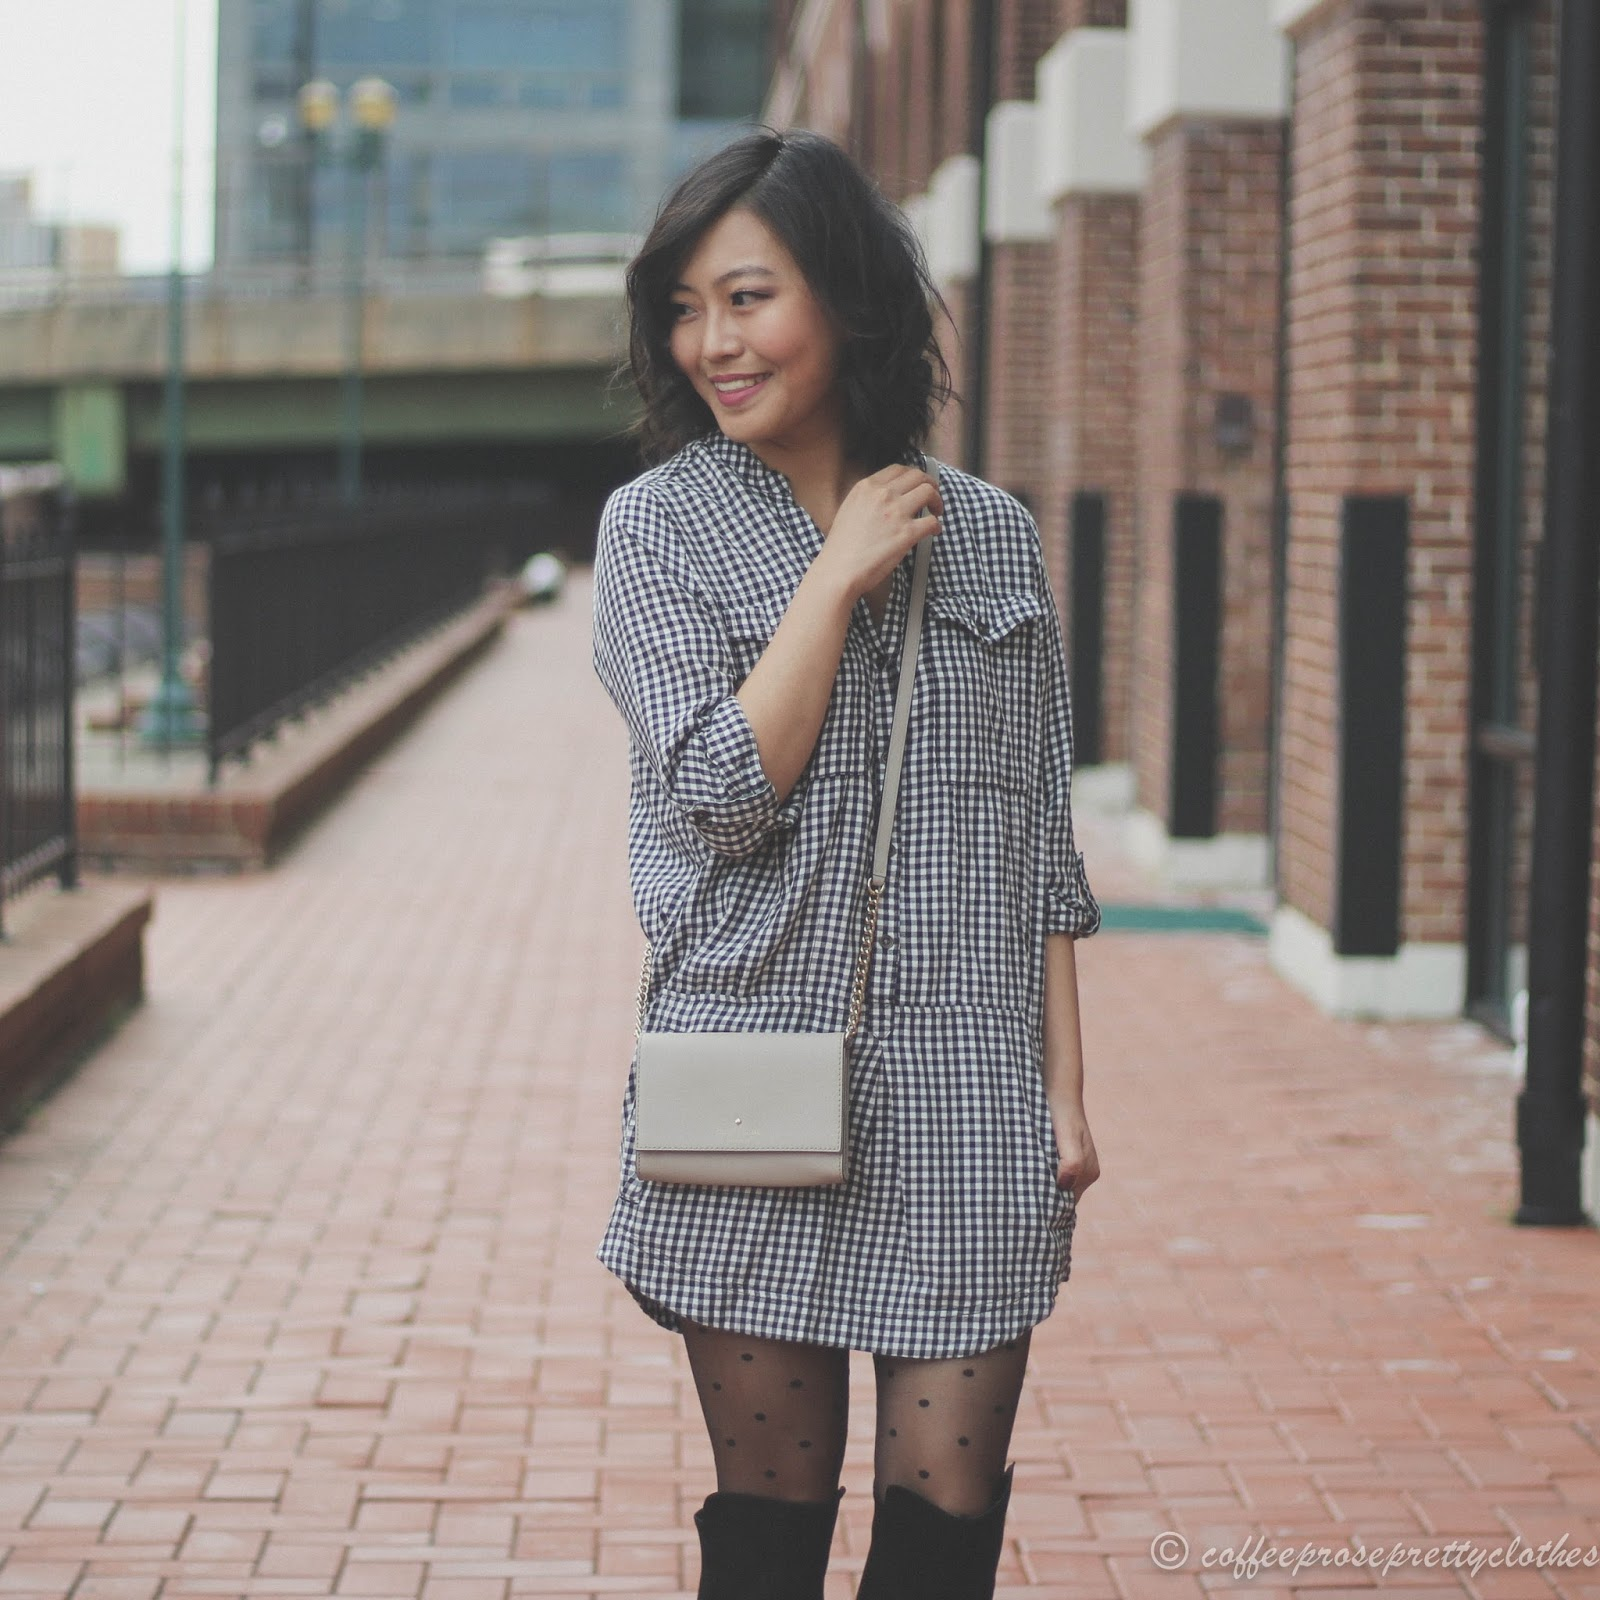 Kate Spade bag, Gap Polka Dot tights, Over the knee boots, flannel shirtdress